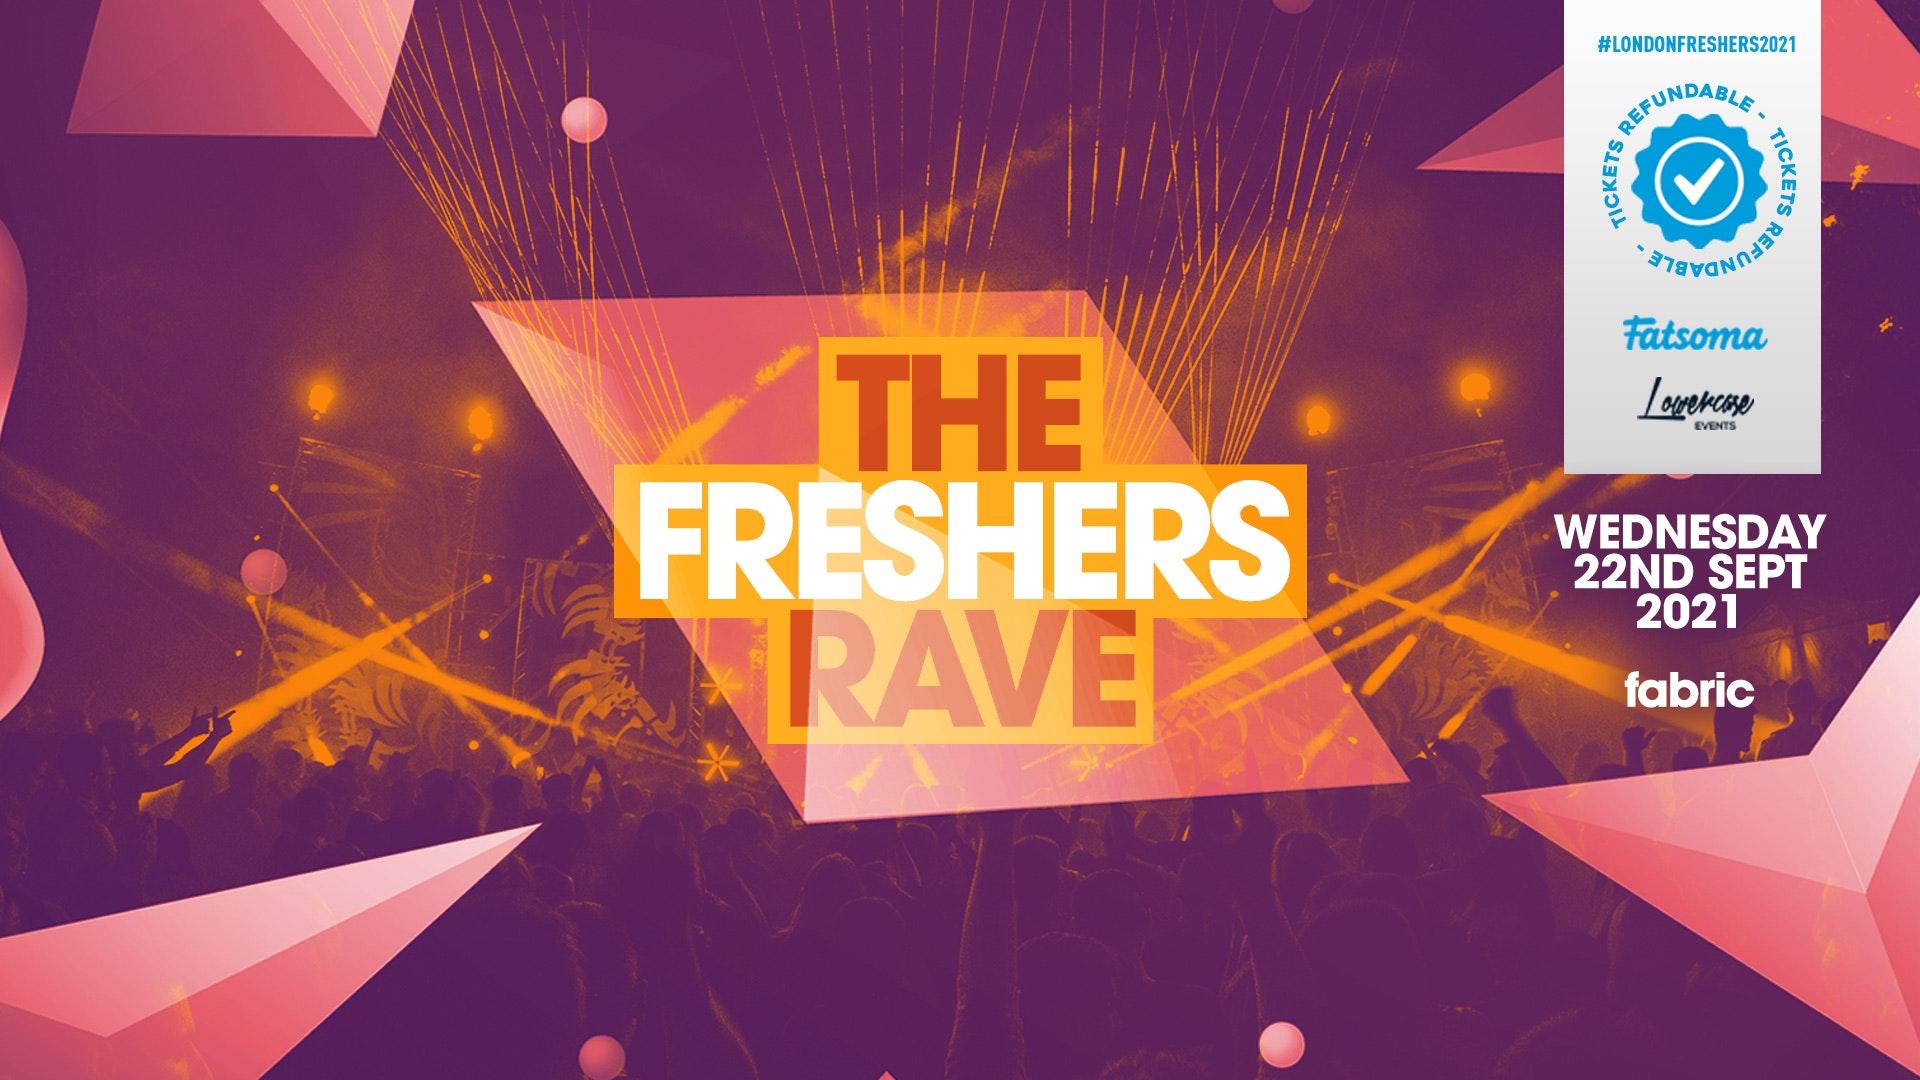 THE 2021 FRESHERS RAVE! // FRESHERS WEEK 1 DAY 4